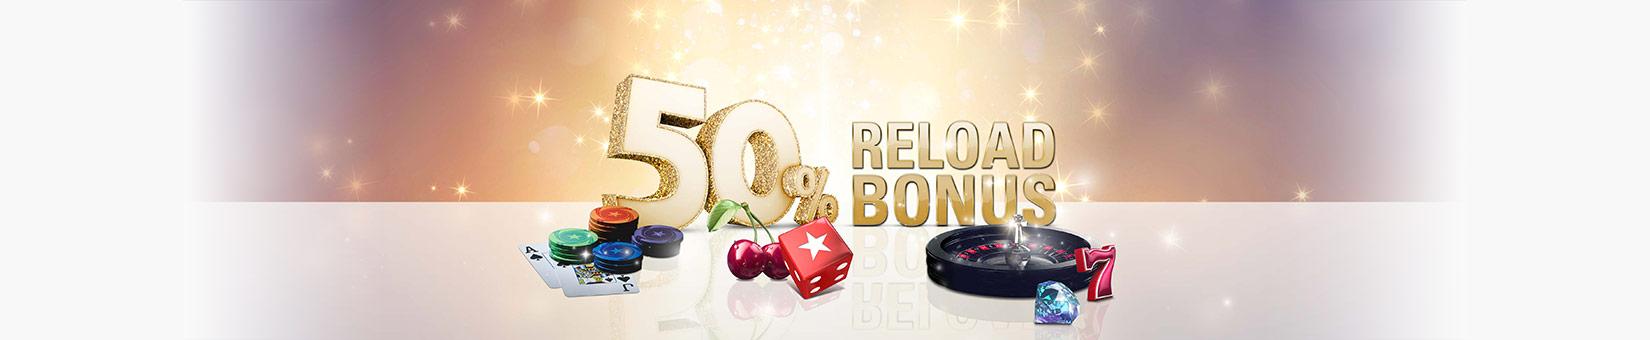 Casino Winter Promotions 23254